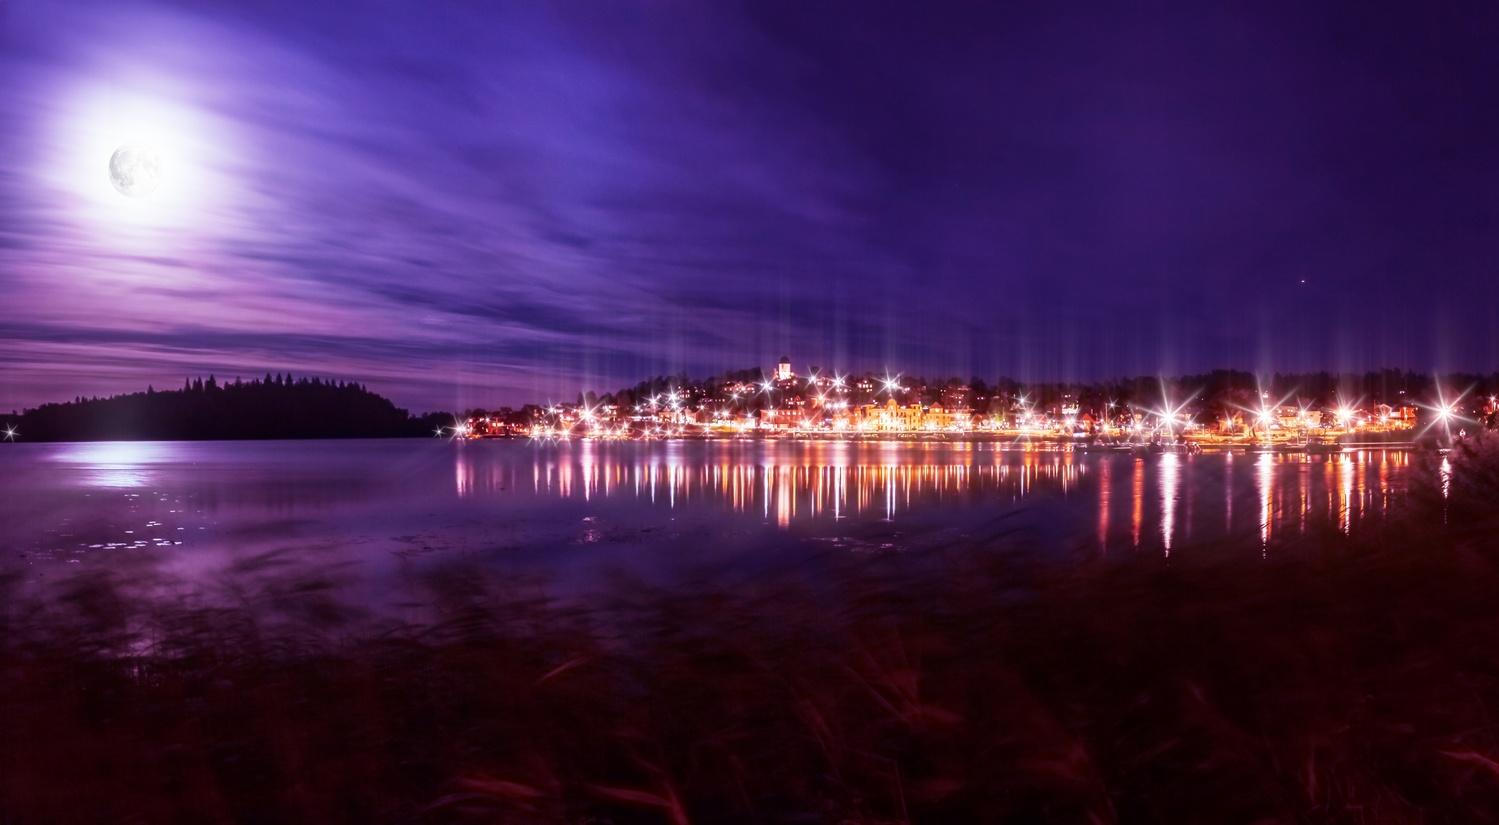 Full Moon Evening by Micke Holmberg